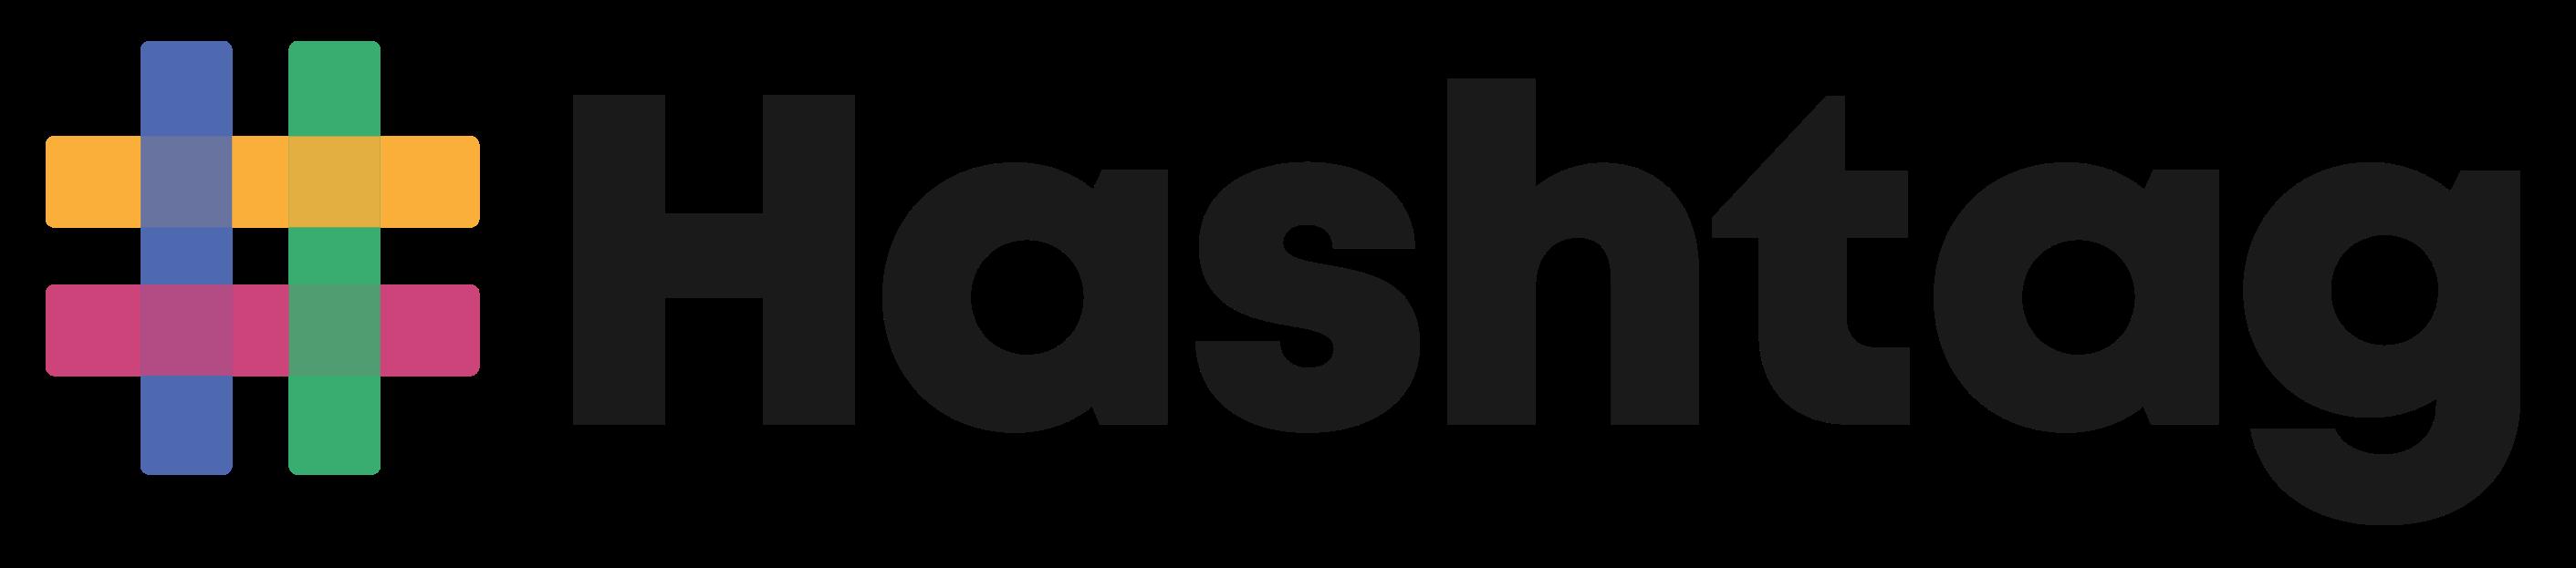 Logo - Hashtag